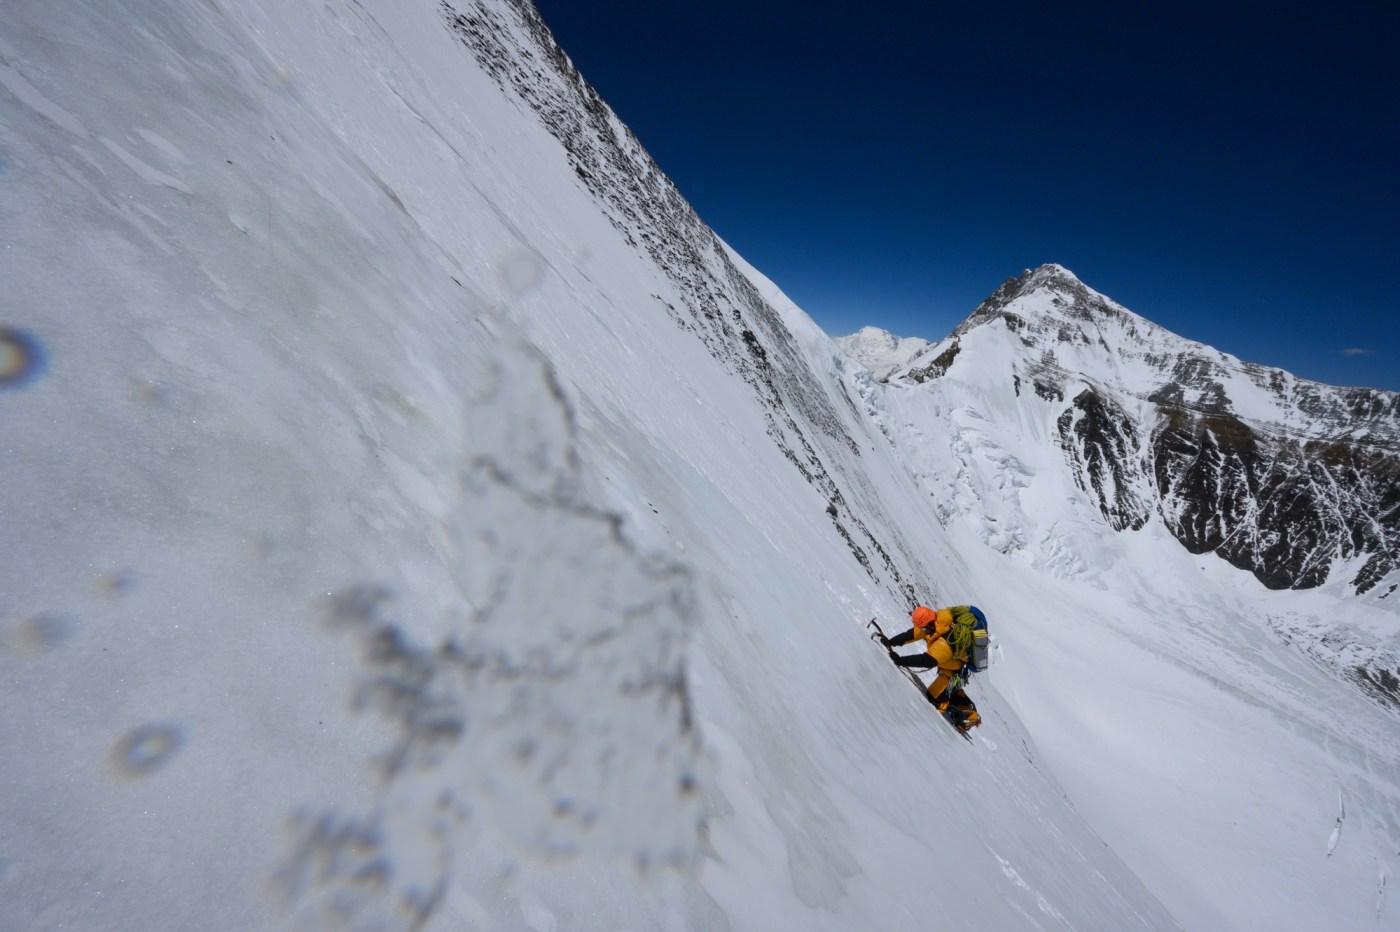 Cory Richards climbing Everest Spring 2019